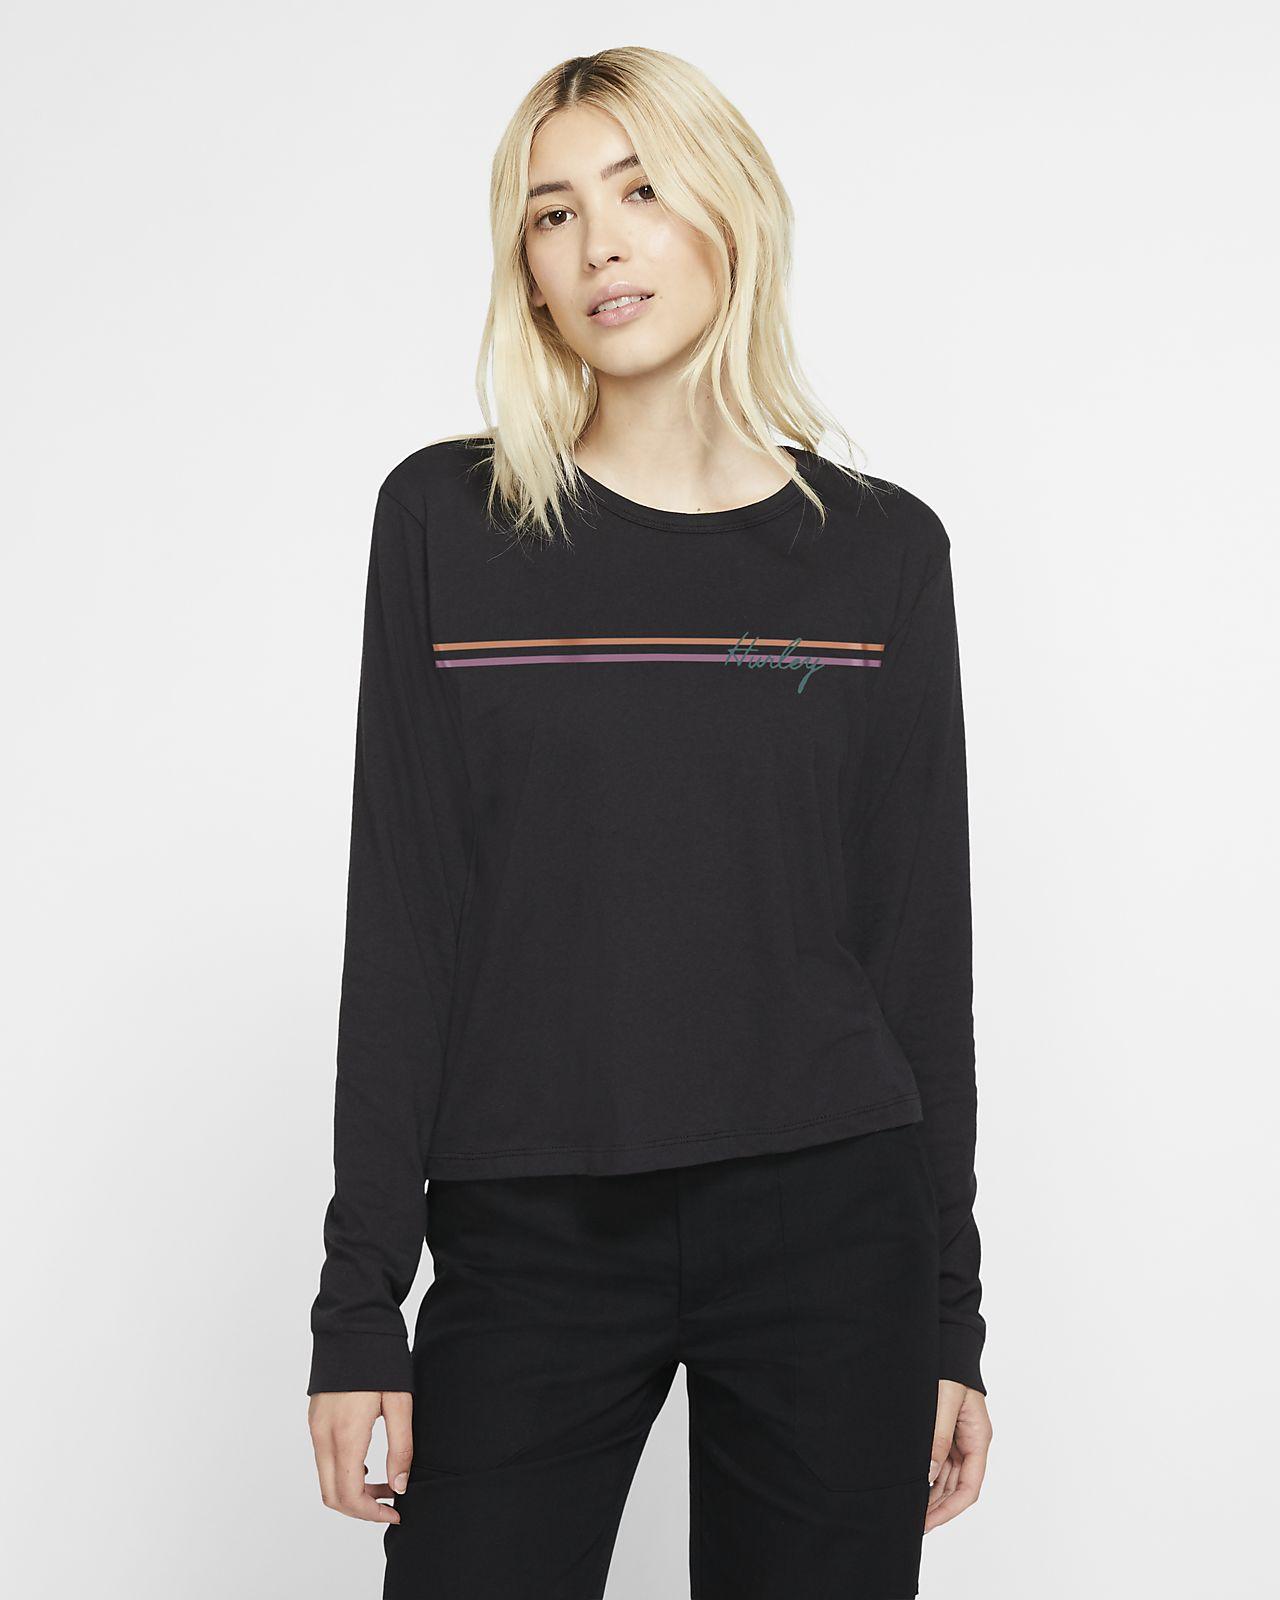 Hurley Line Bars Perfect Women's Long-Sleeve T-Shirt